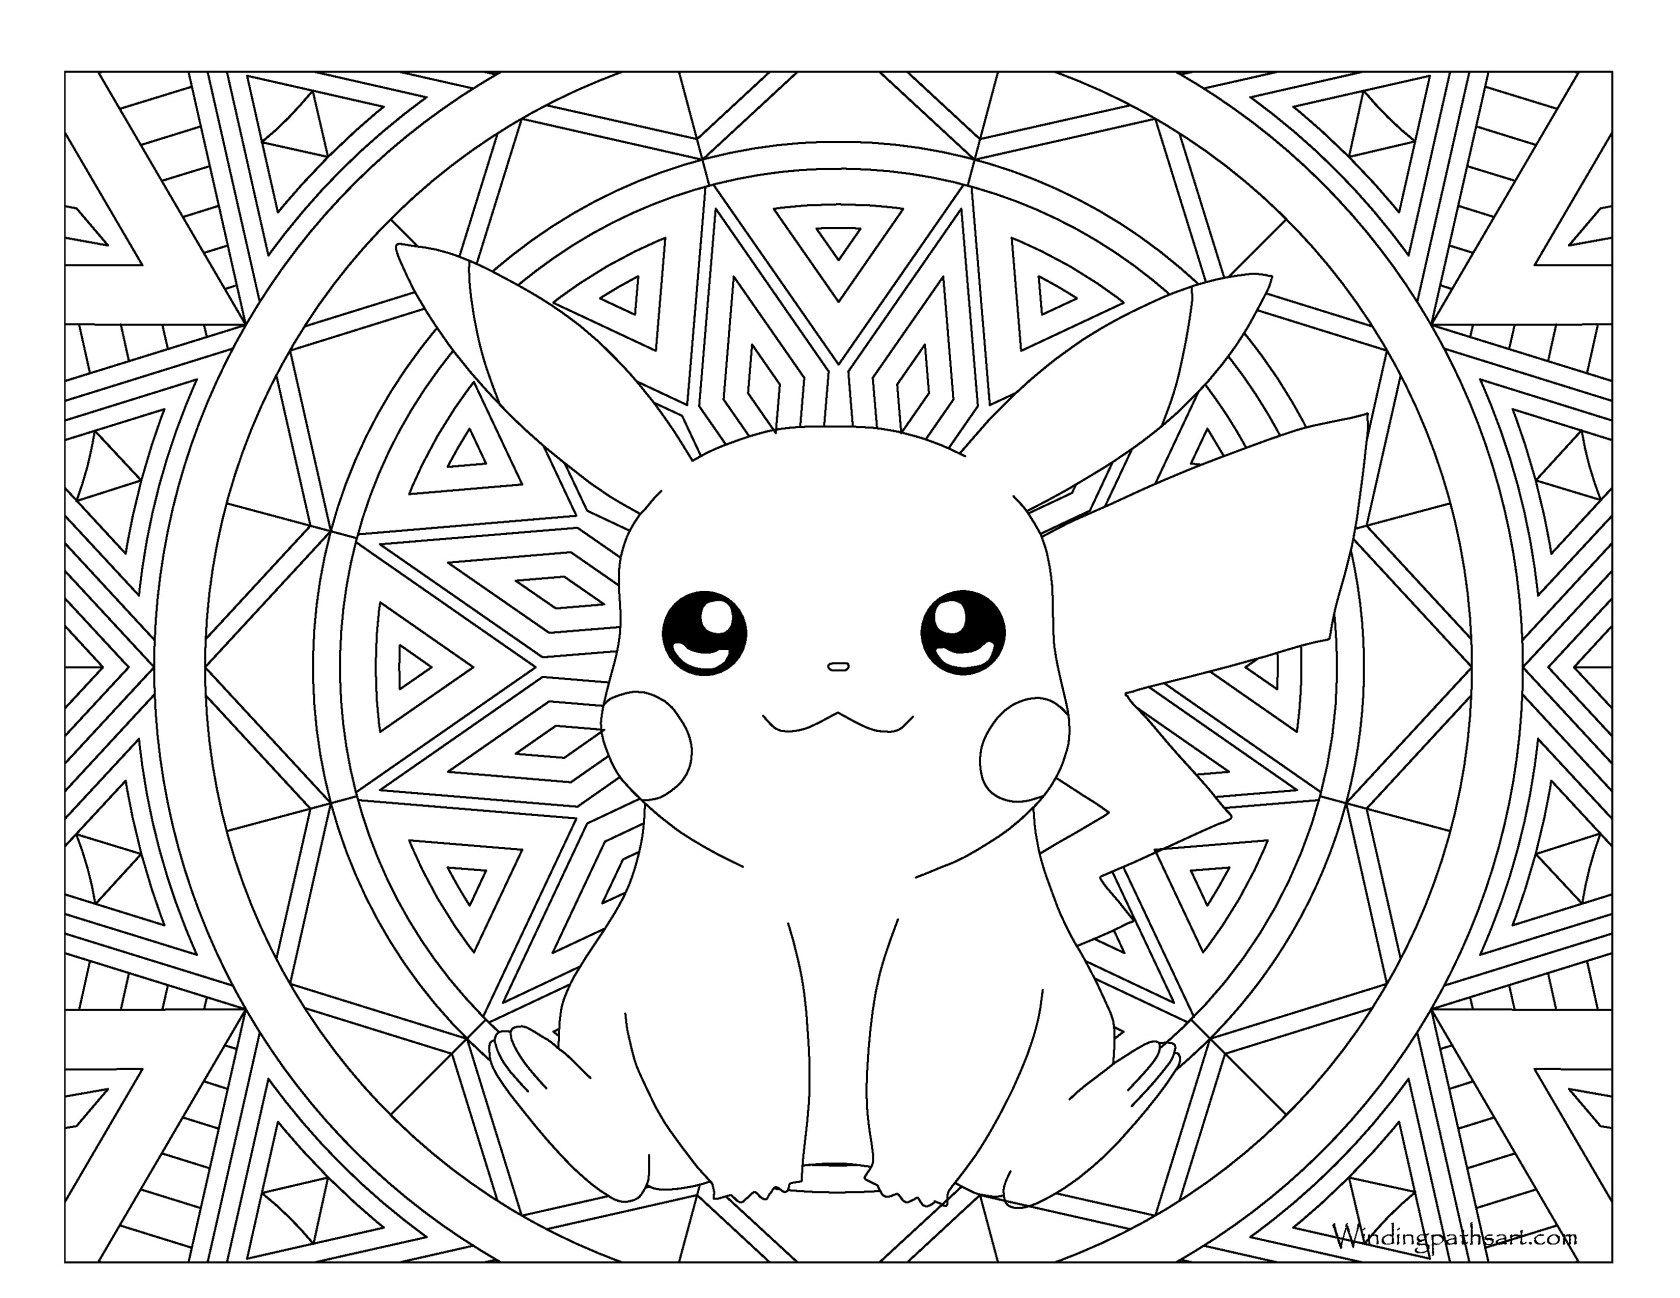 27 Inspiration Image Of Free Printable Pokemon Coloring Pages Entitlementtrap Com Pokemon Coloring Sheets Pikachu Coloring Page Pokemon Coloring Pages